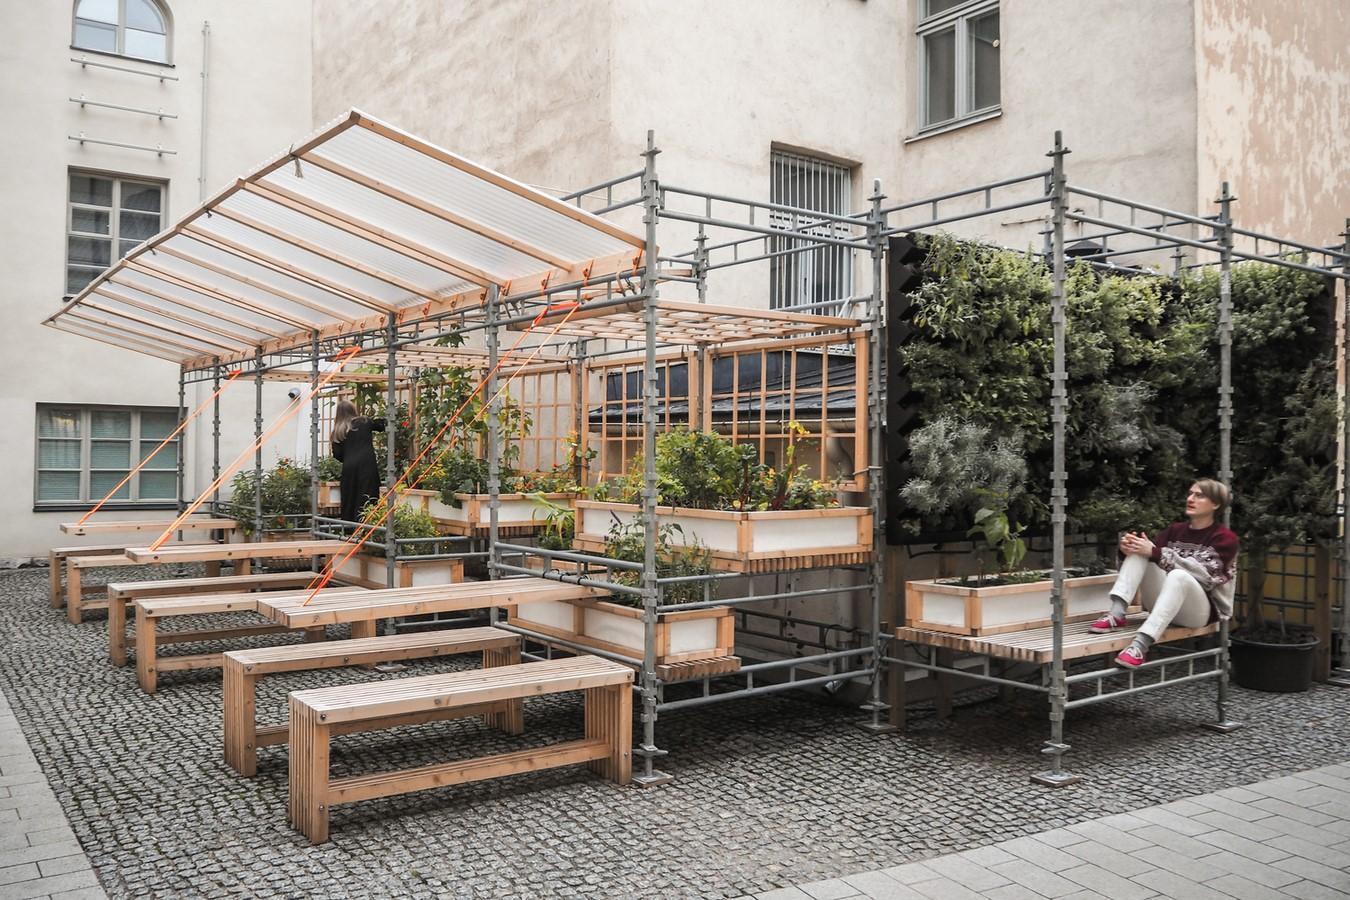 Urban regeneration through public space - Sheet21